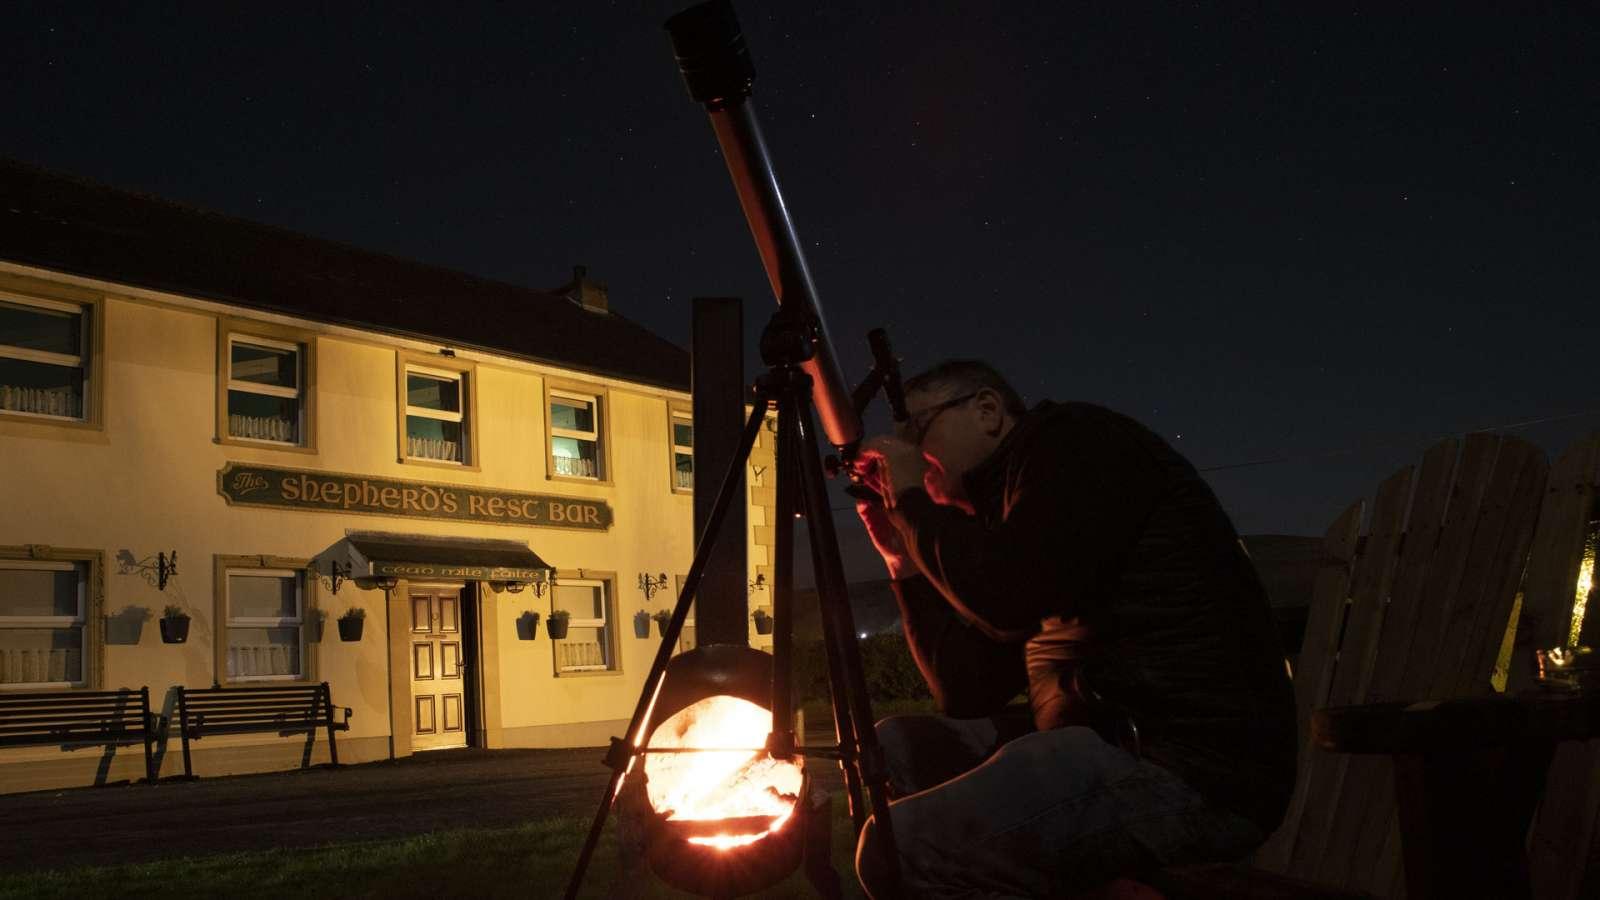 Watching Dark Sky at The Shepherds Rest